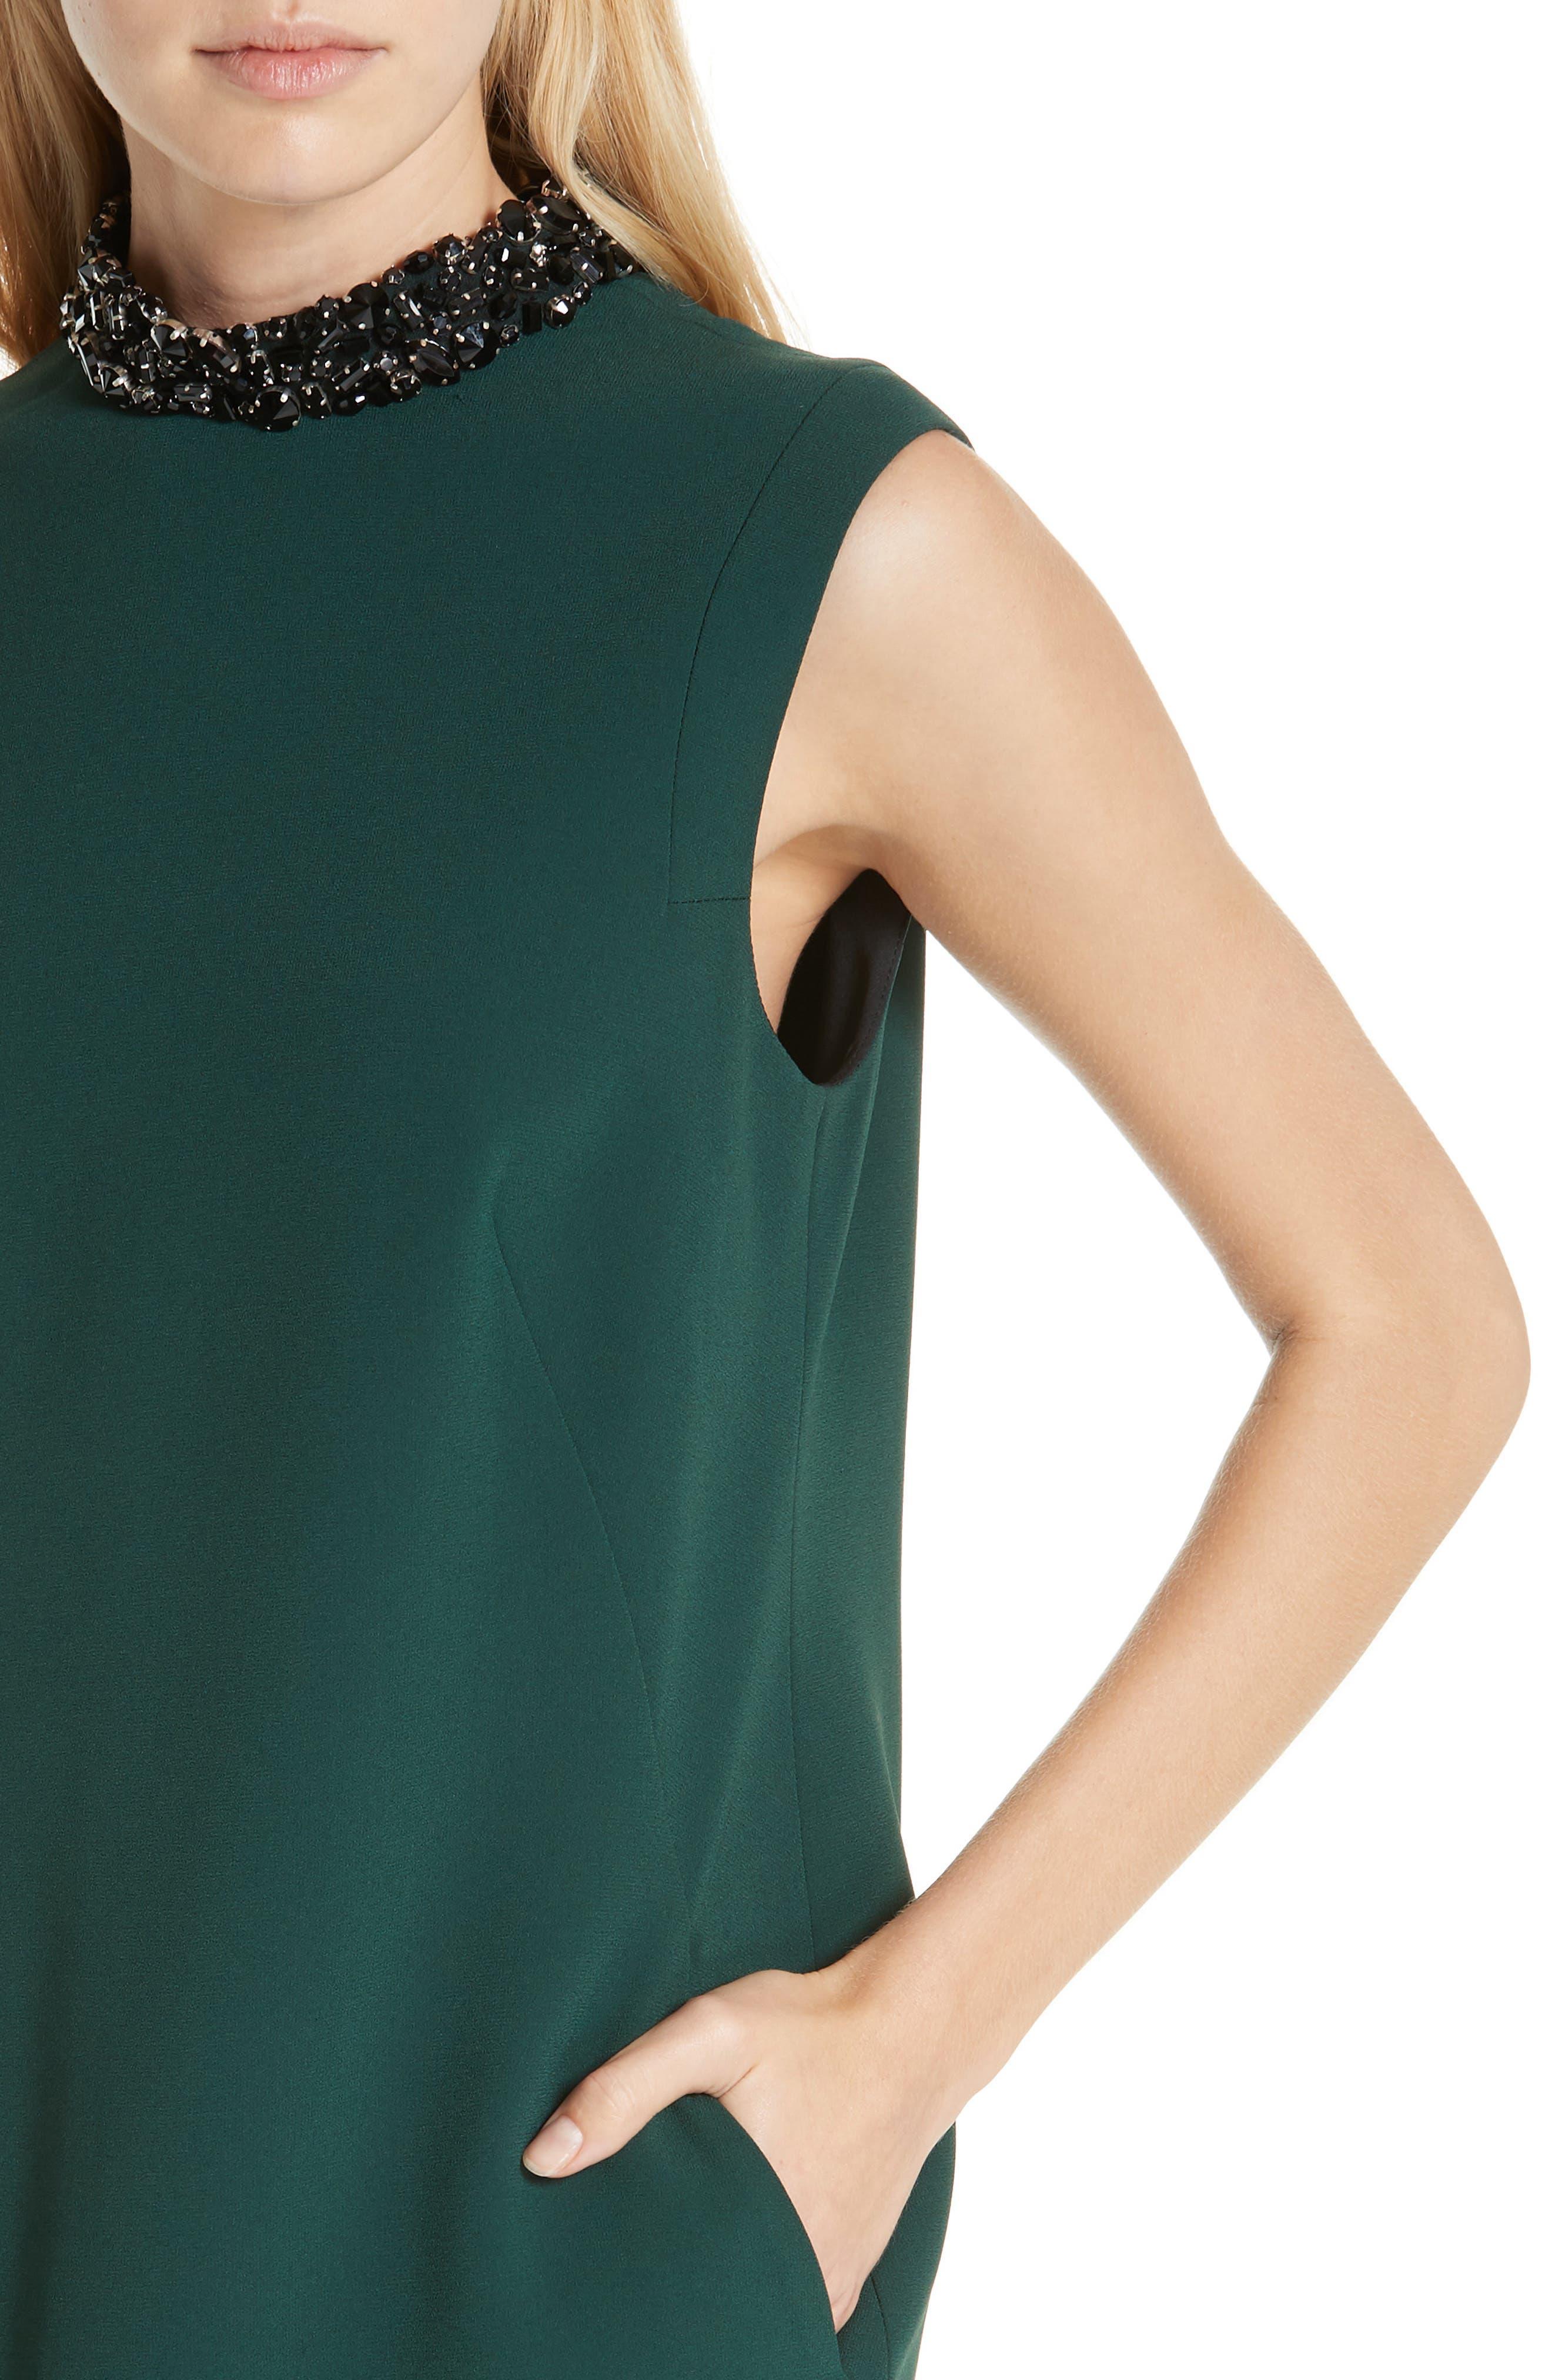 Verona Jewel Neck Dress,                             Alternate thumbnail 4, color,                             DK. GREEN